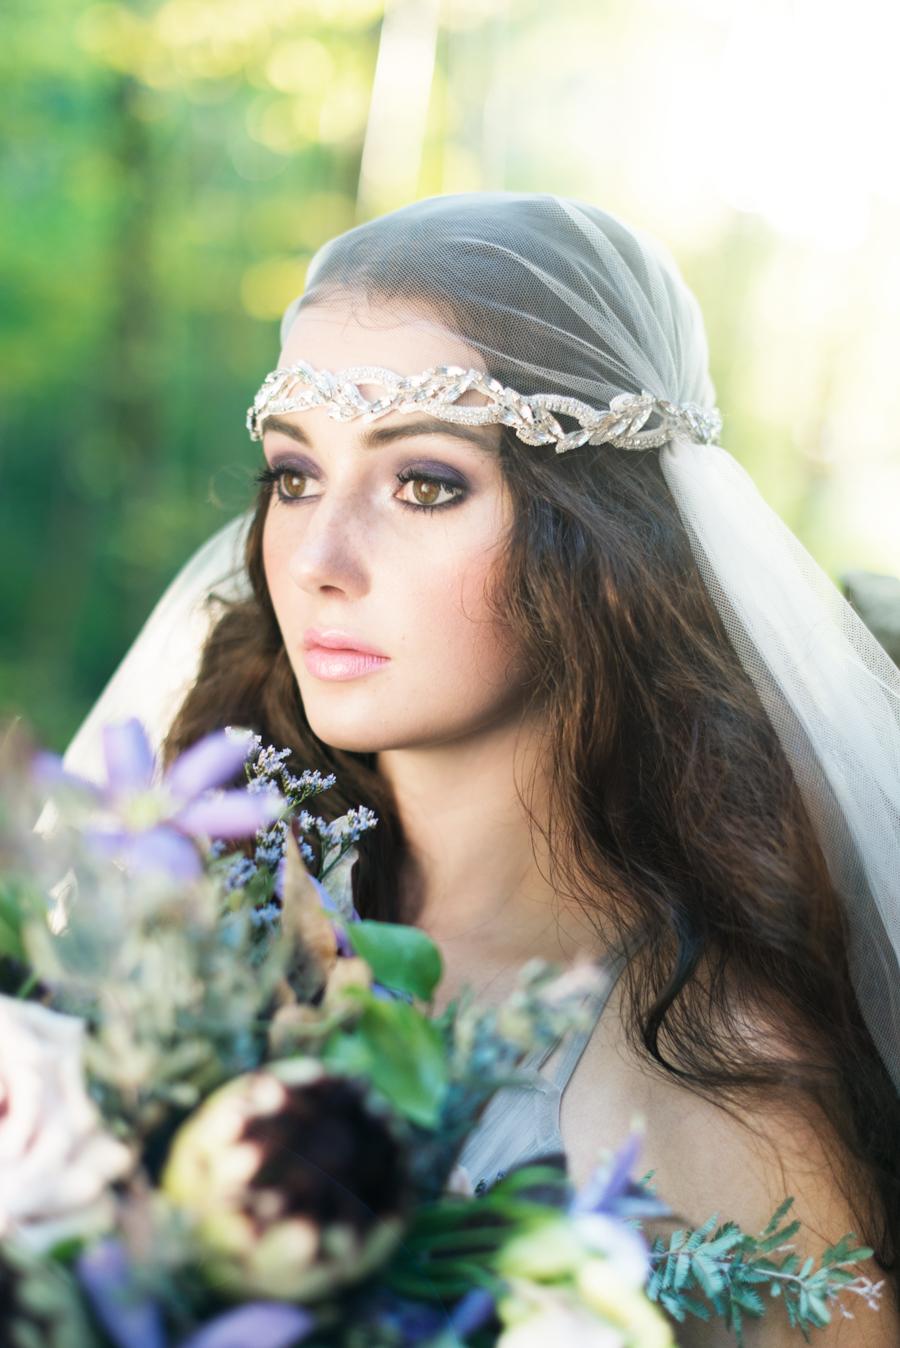 Whitney-Heard-Photography-Blair-Styled-Shoot-Web-17.jpg